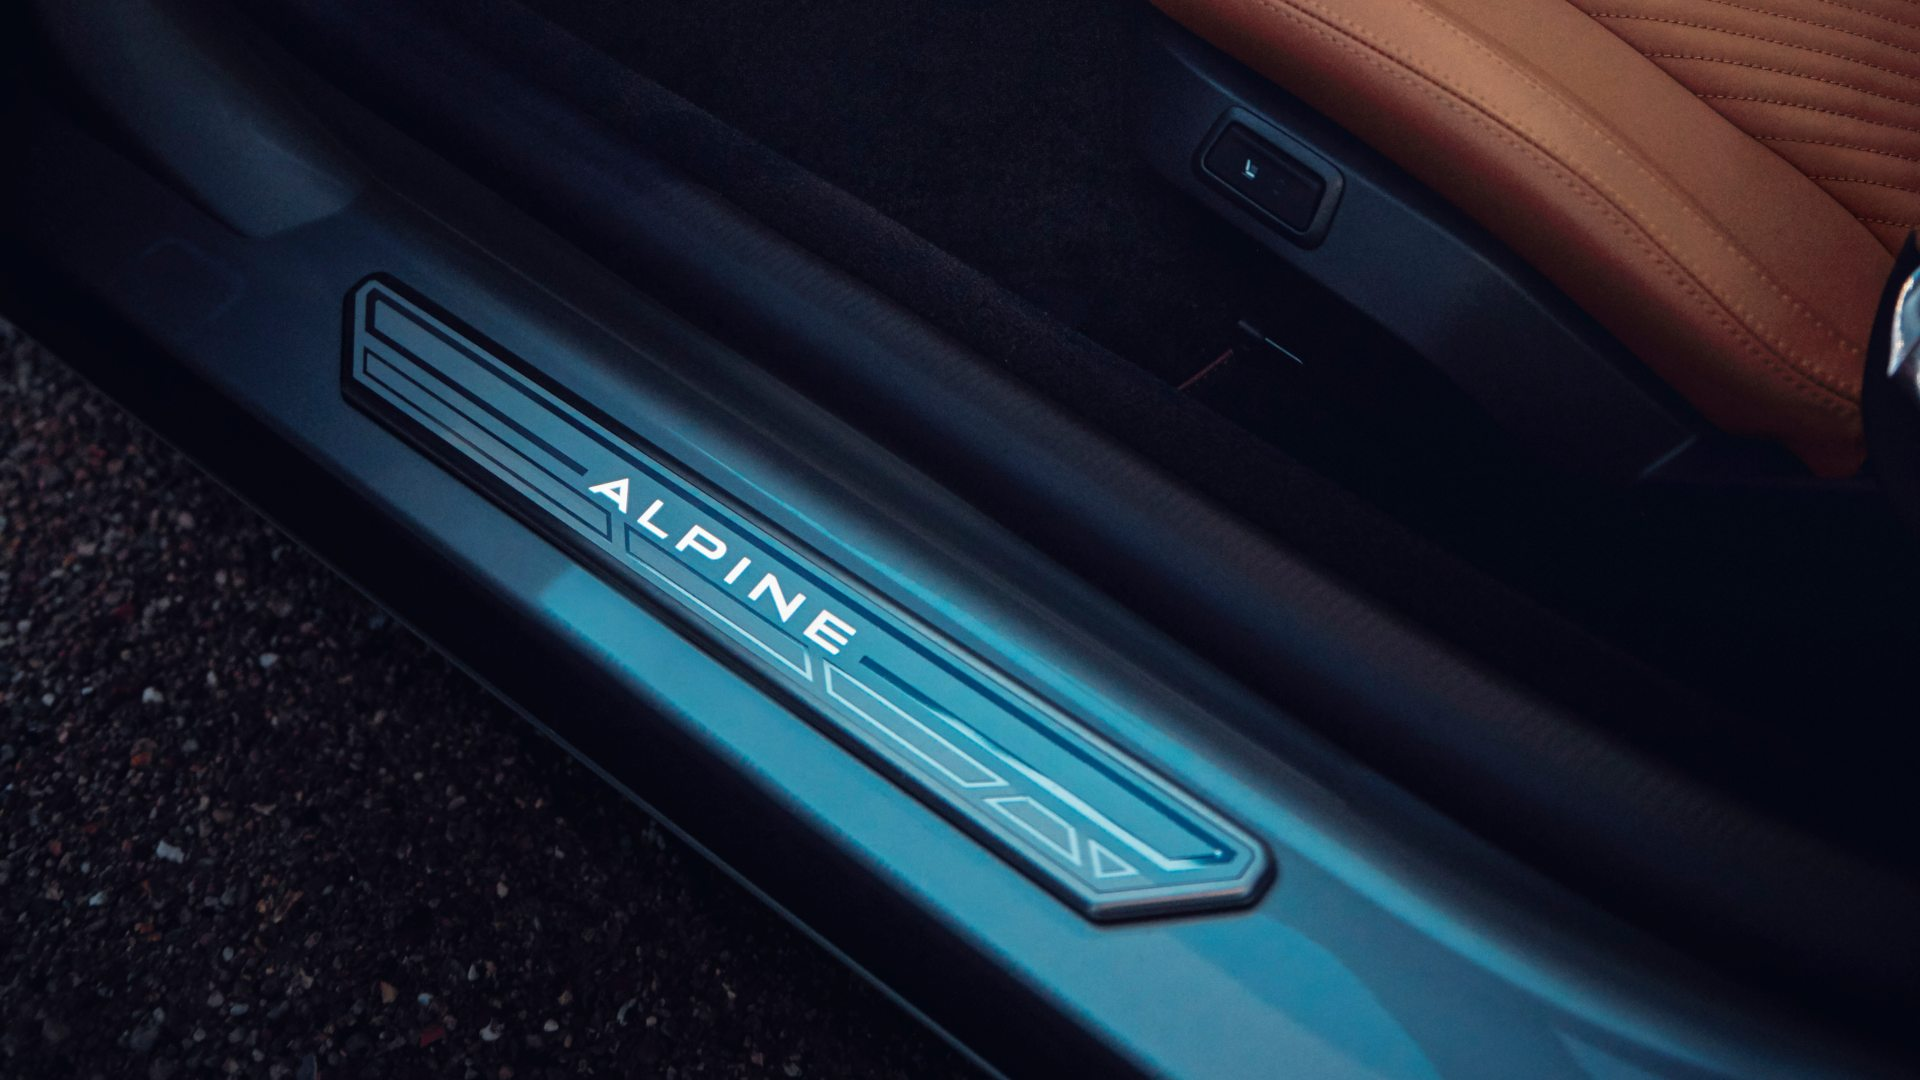 Confirmado: Alpine se reiventará como fabricante de deportivos